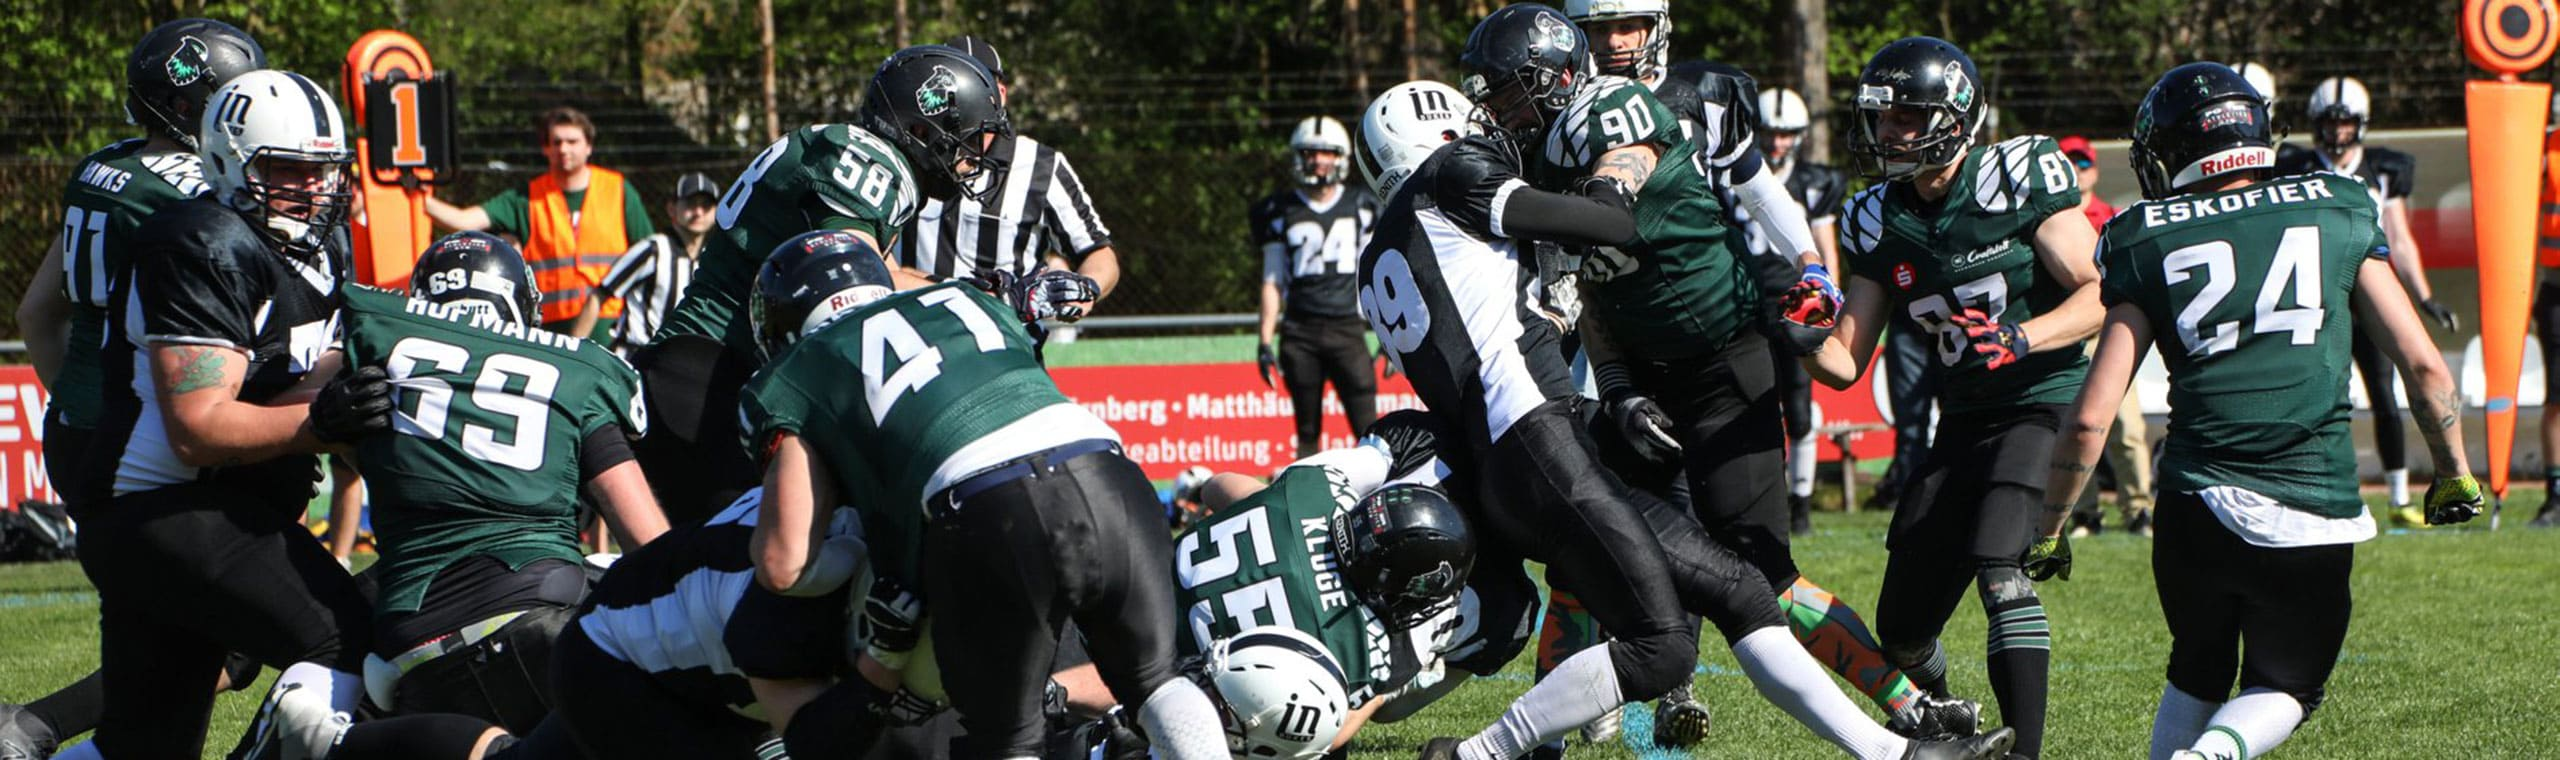 Kontakt-sport: Hawk Football